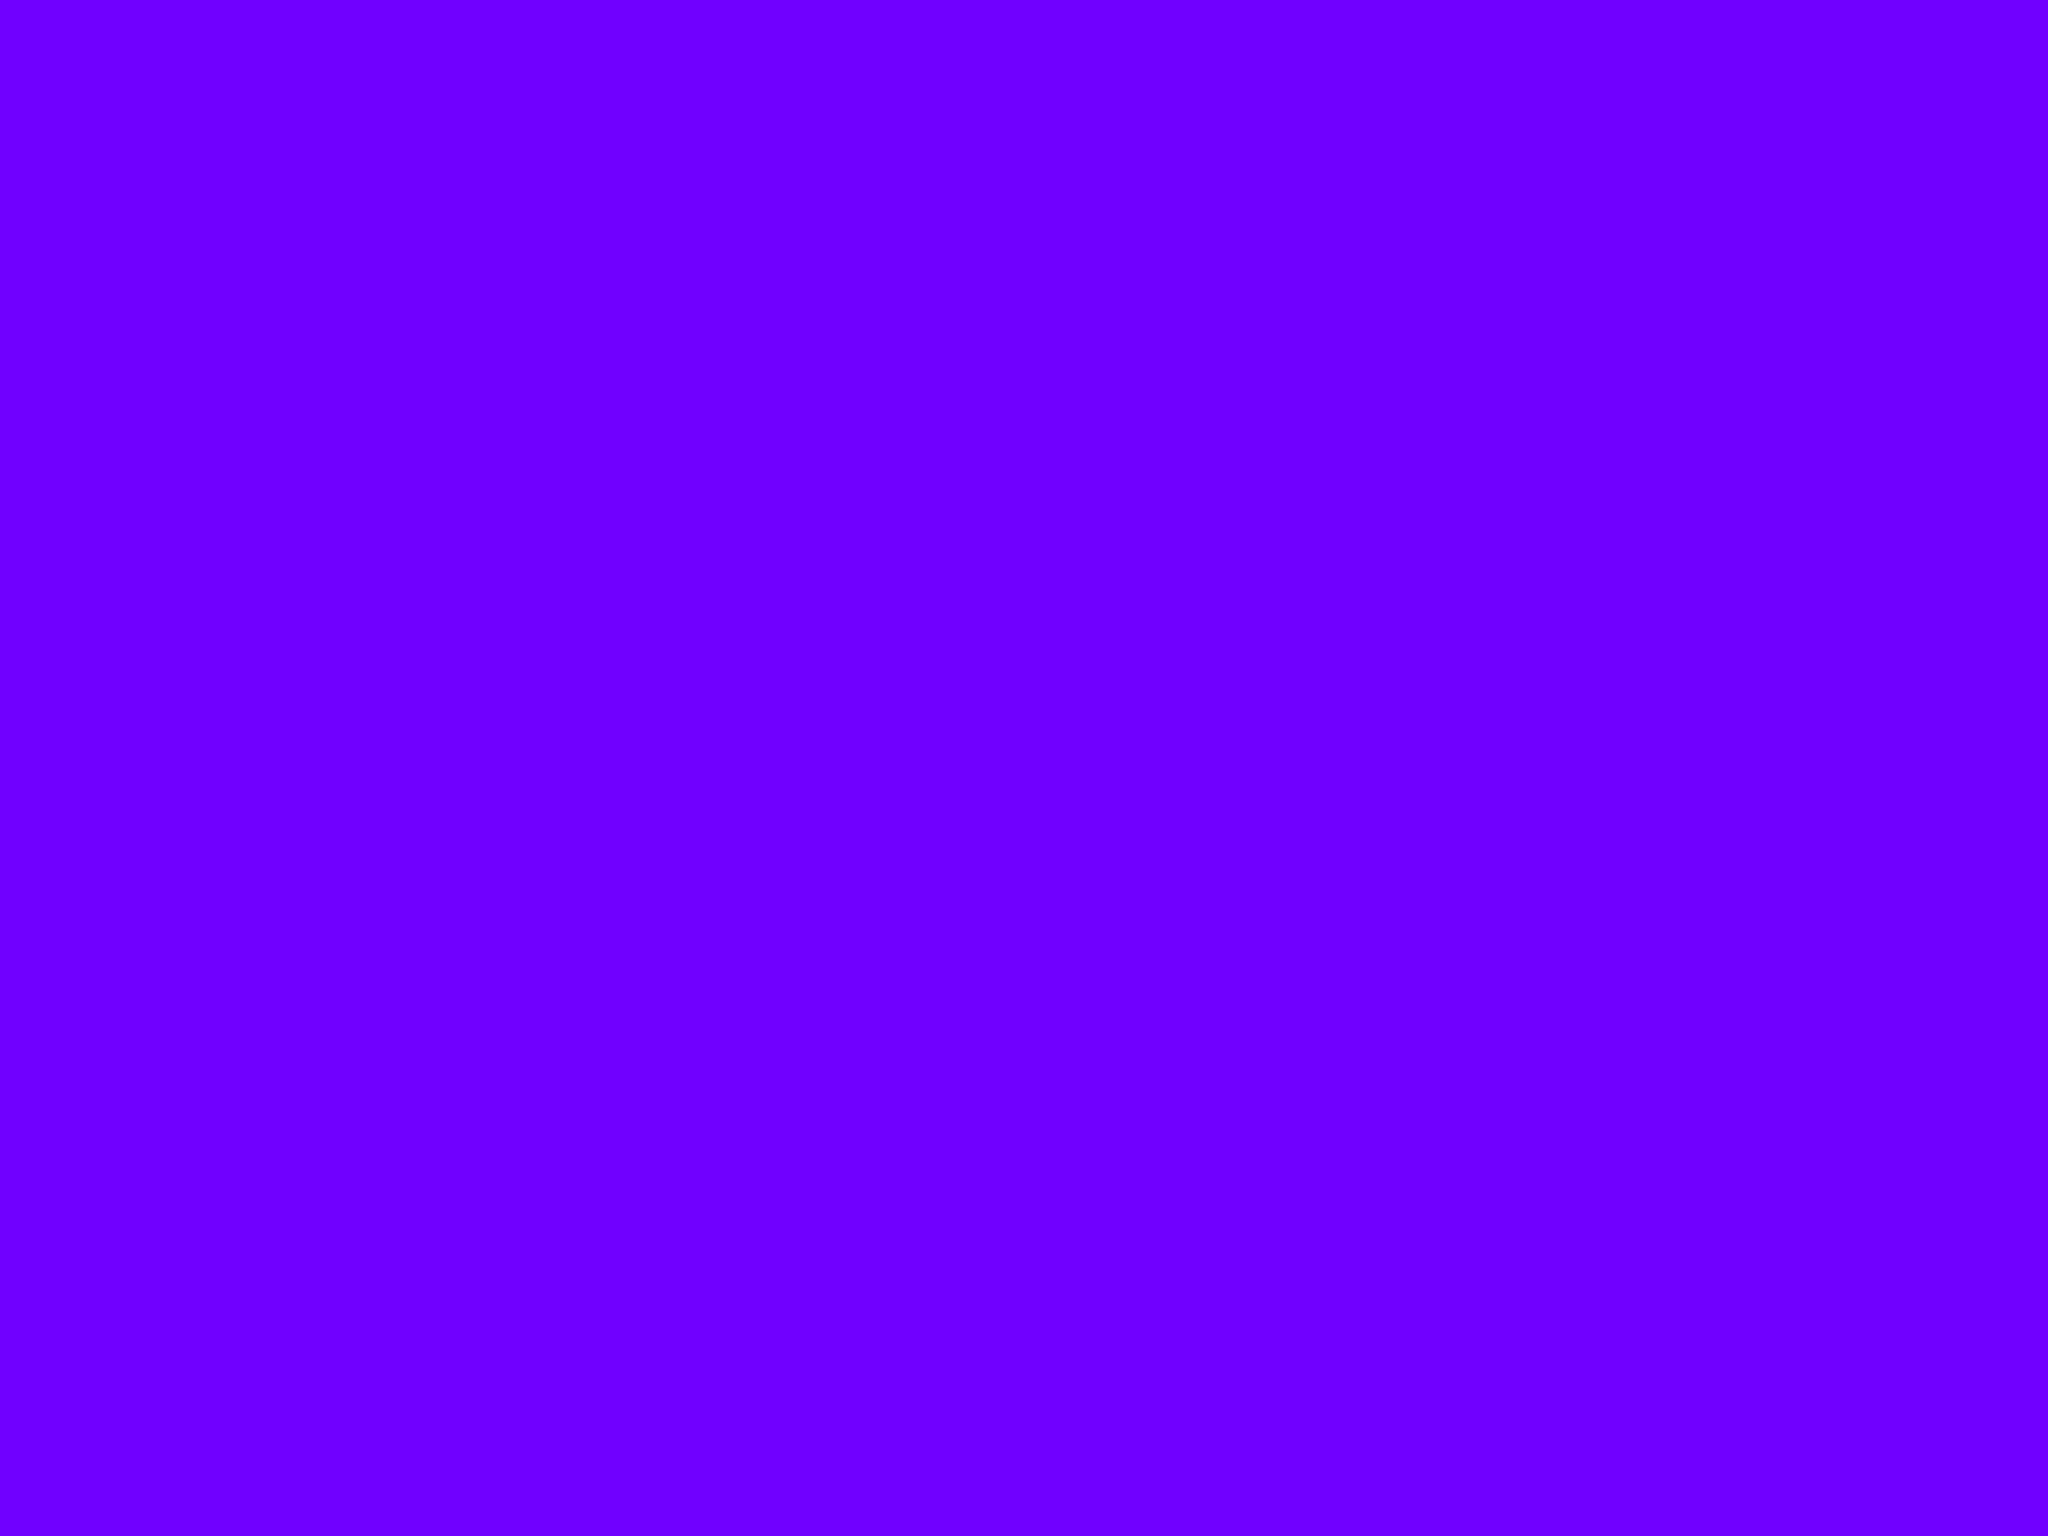 2048x1536 Electric Indigo Solid Color Background